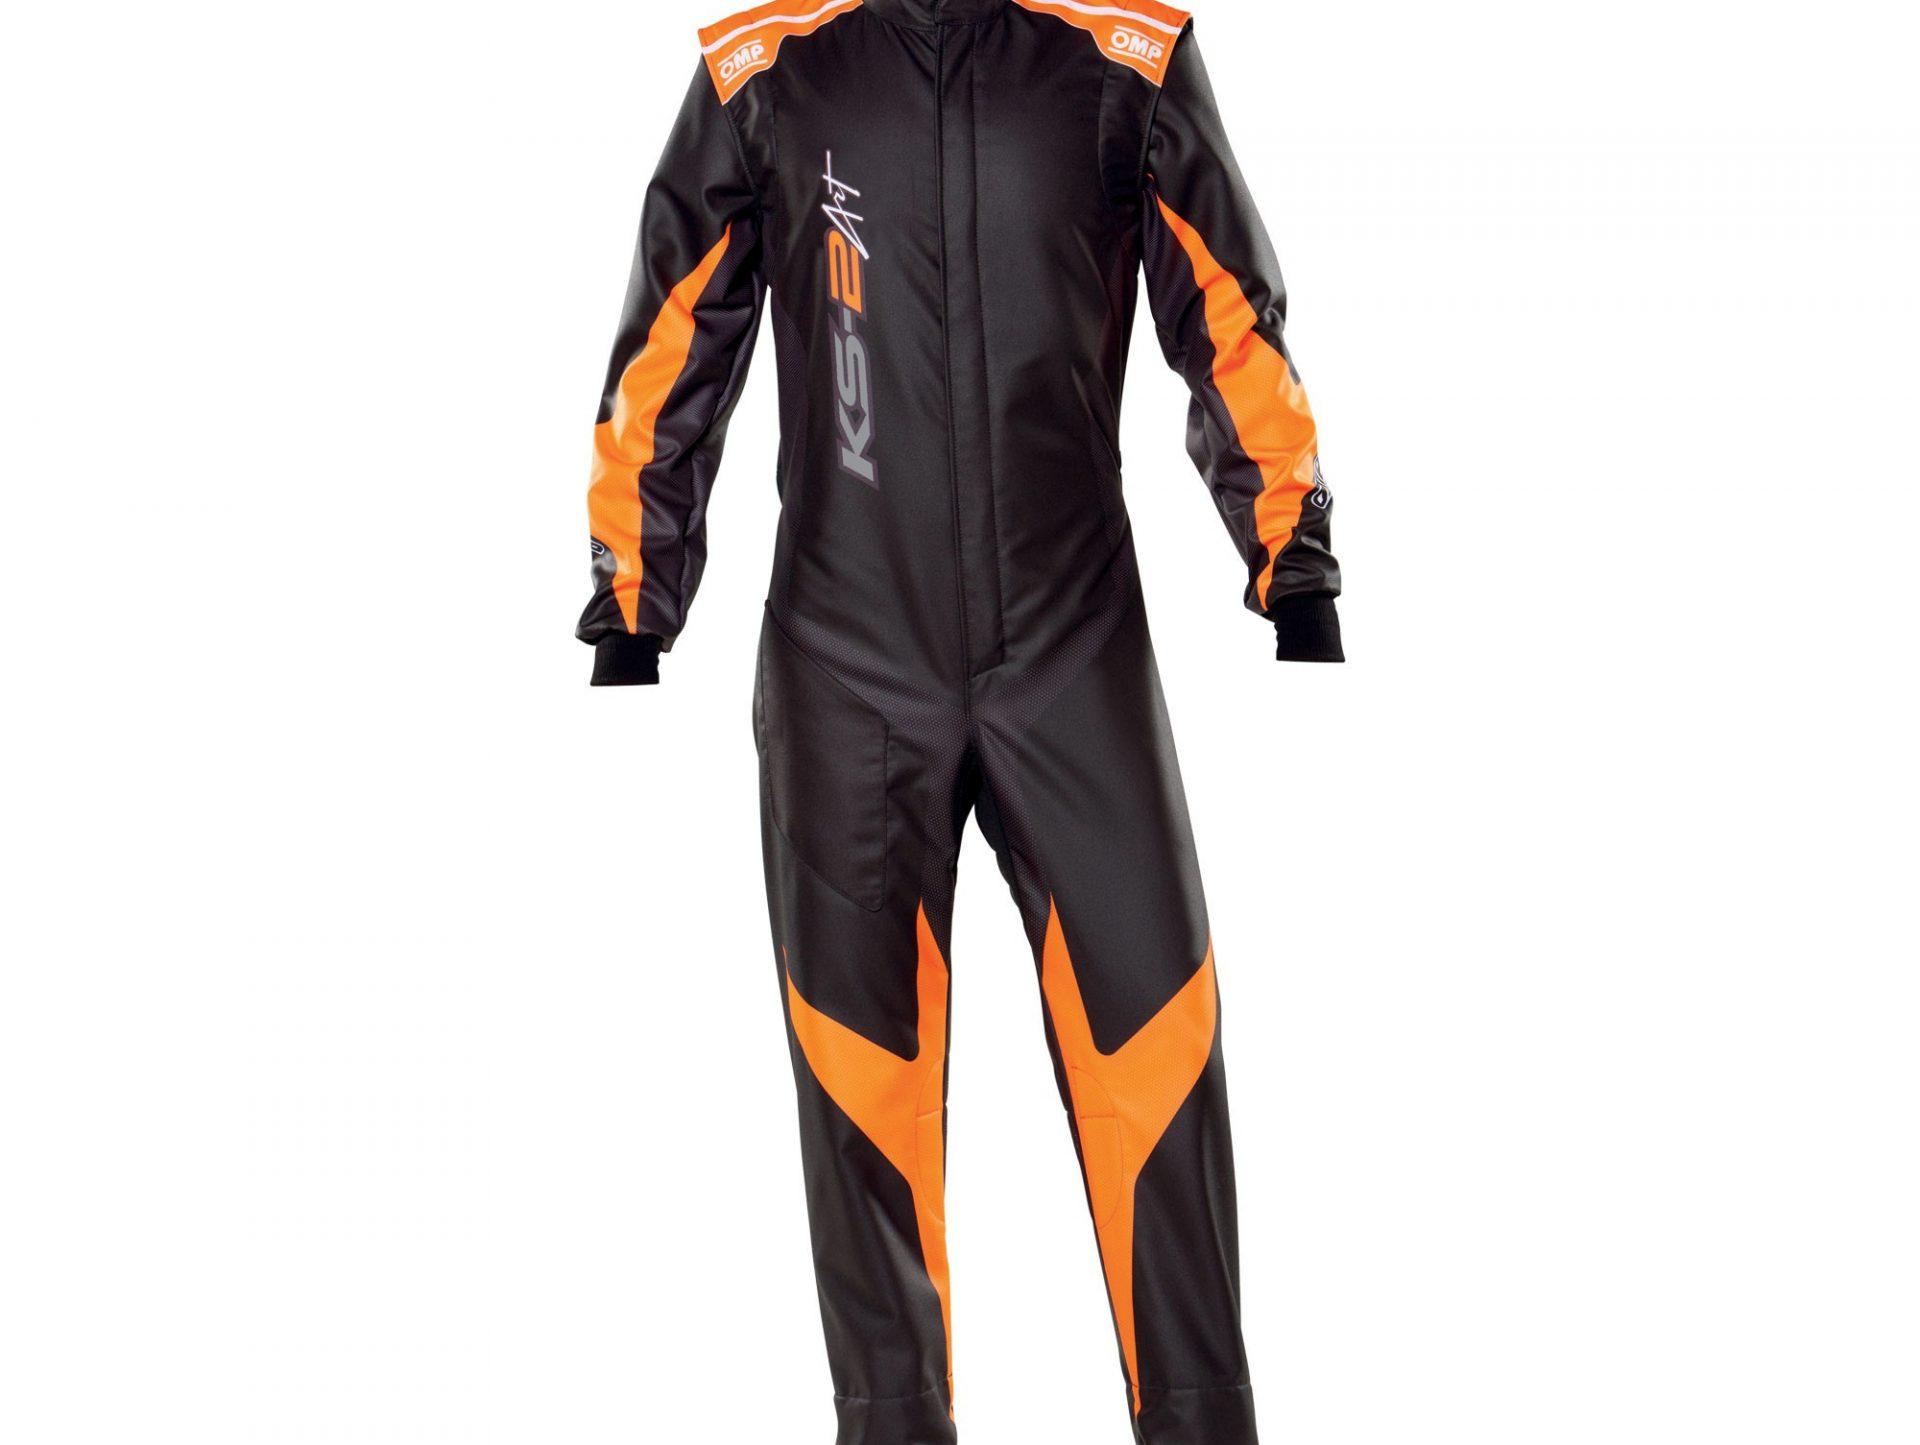 Нов продукт: OMP KS-2 Art Suit, Karting Suit